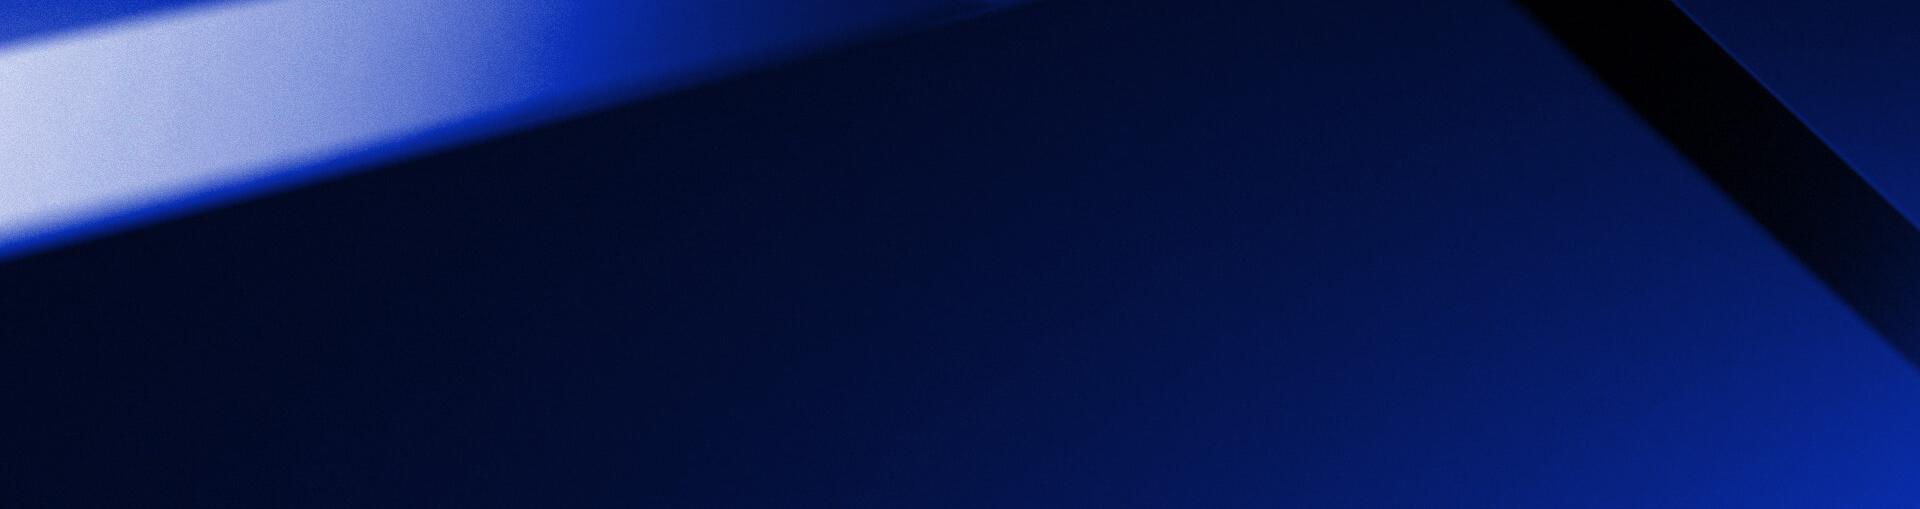 rra-background-blue-5-2021.jpg